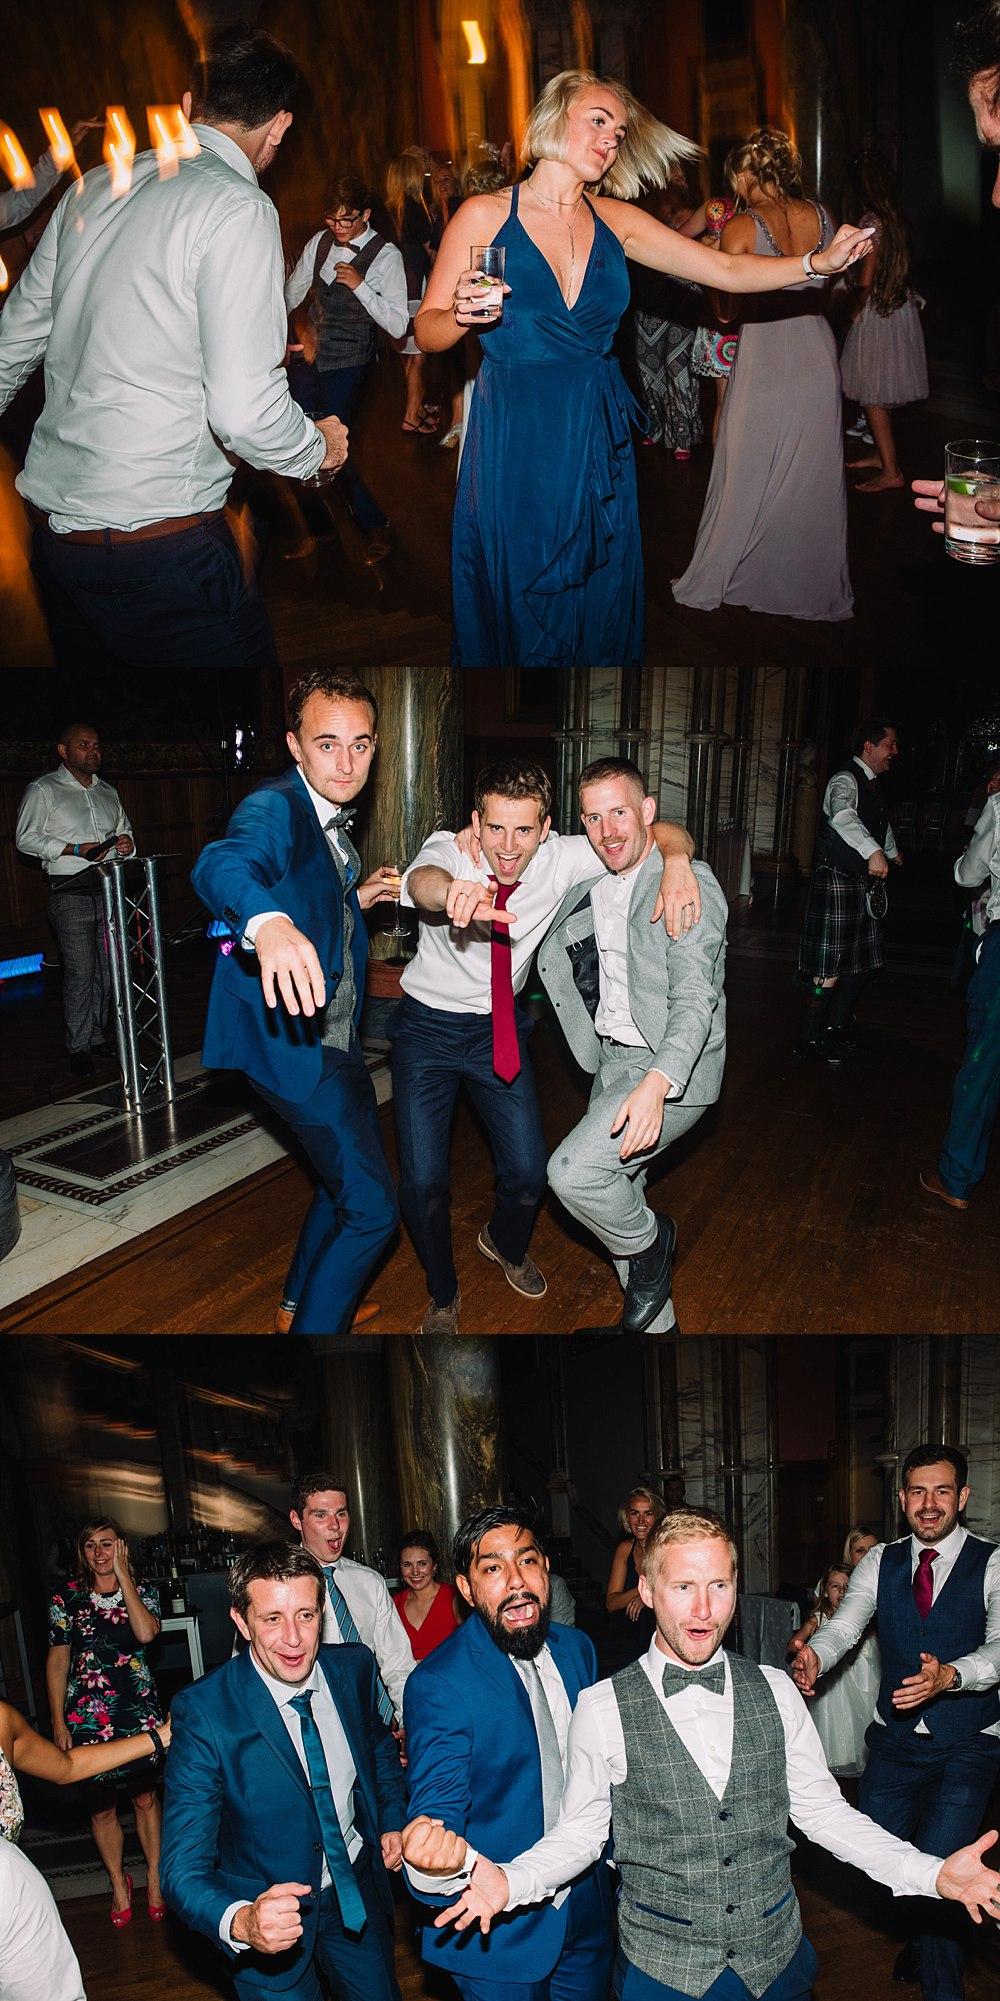 Fine Art Wedding Photographers,The Gibsons,ayrshire wedding photographer,colourful wedding photographers,elegant wedding photographers glasgow,light and bright,light and bright wedding photographers scotland,mount stuart wedding,natural wedding photographers,romantic photographers Scotland,